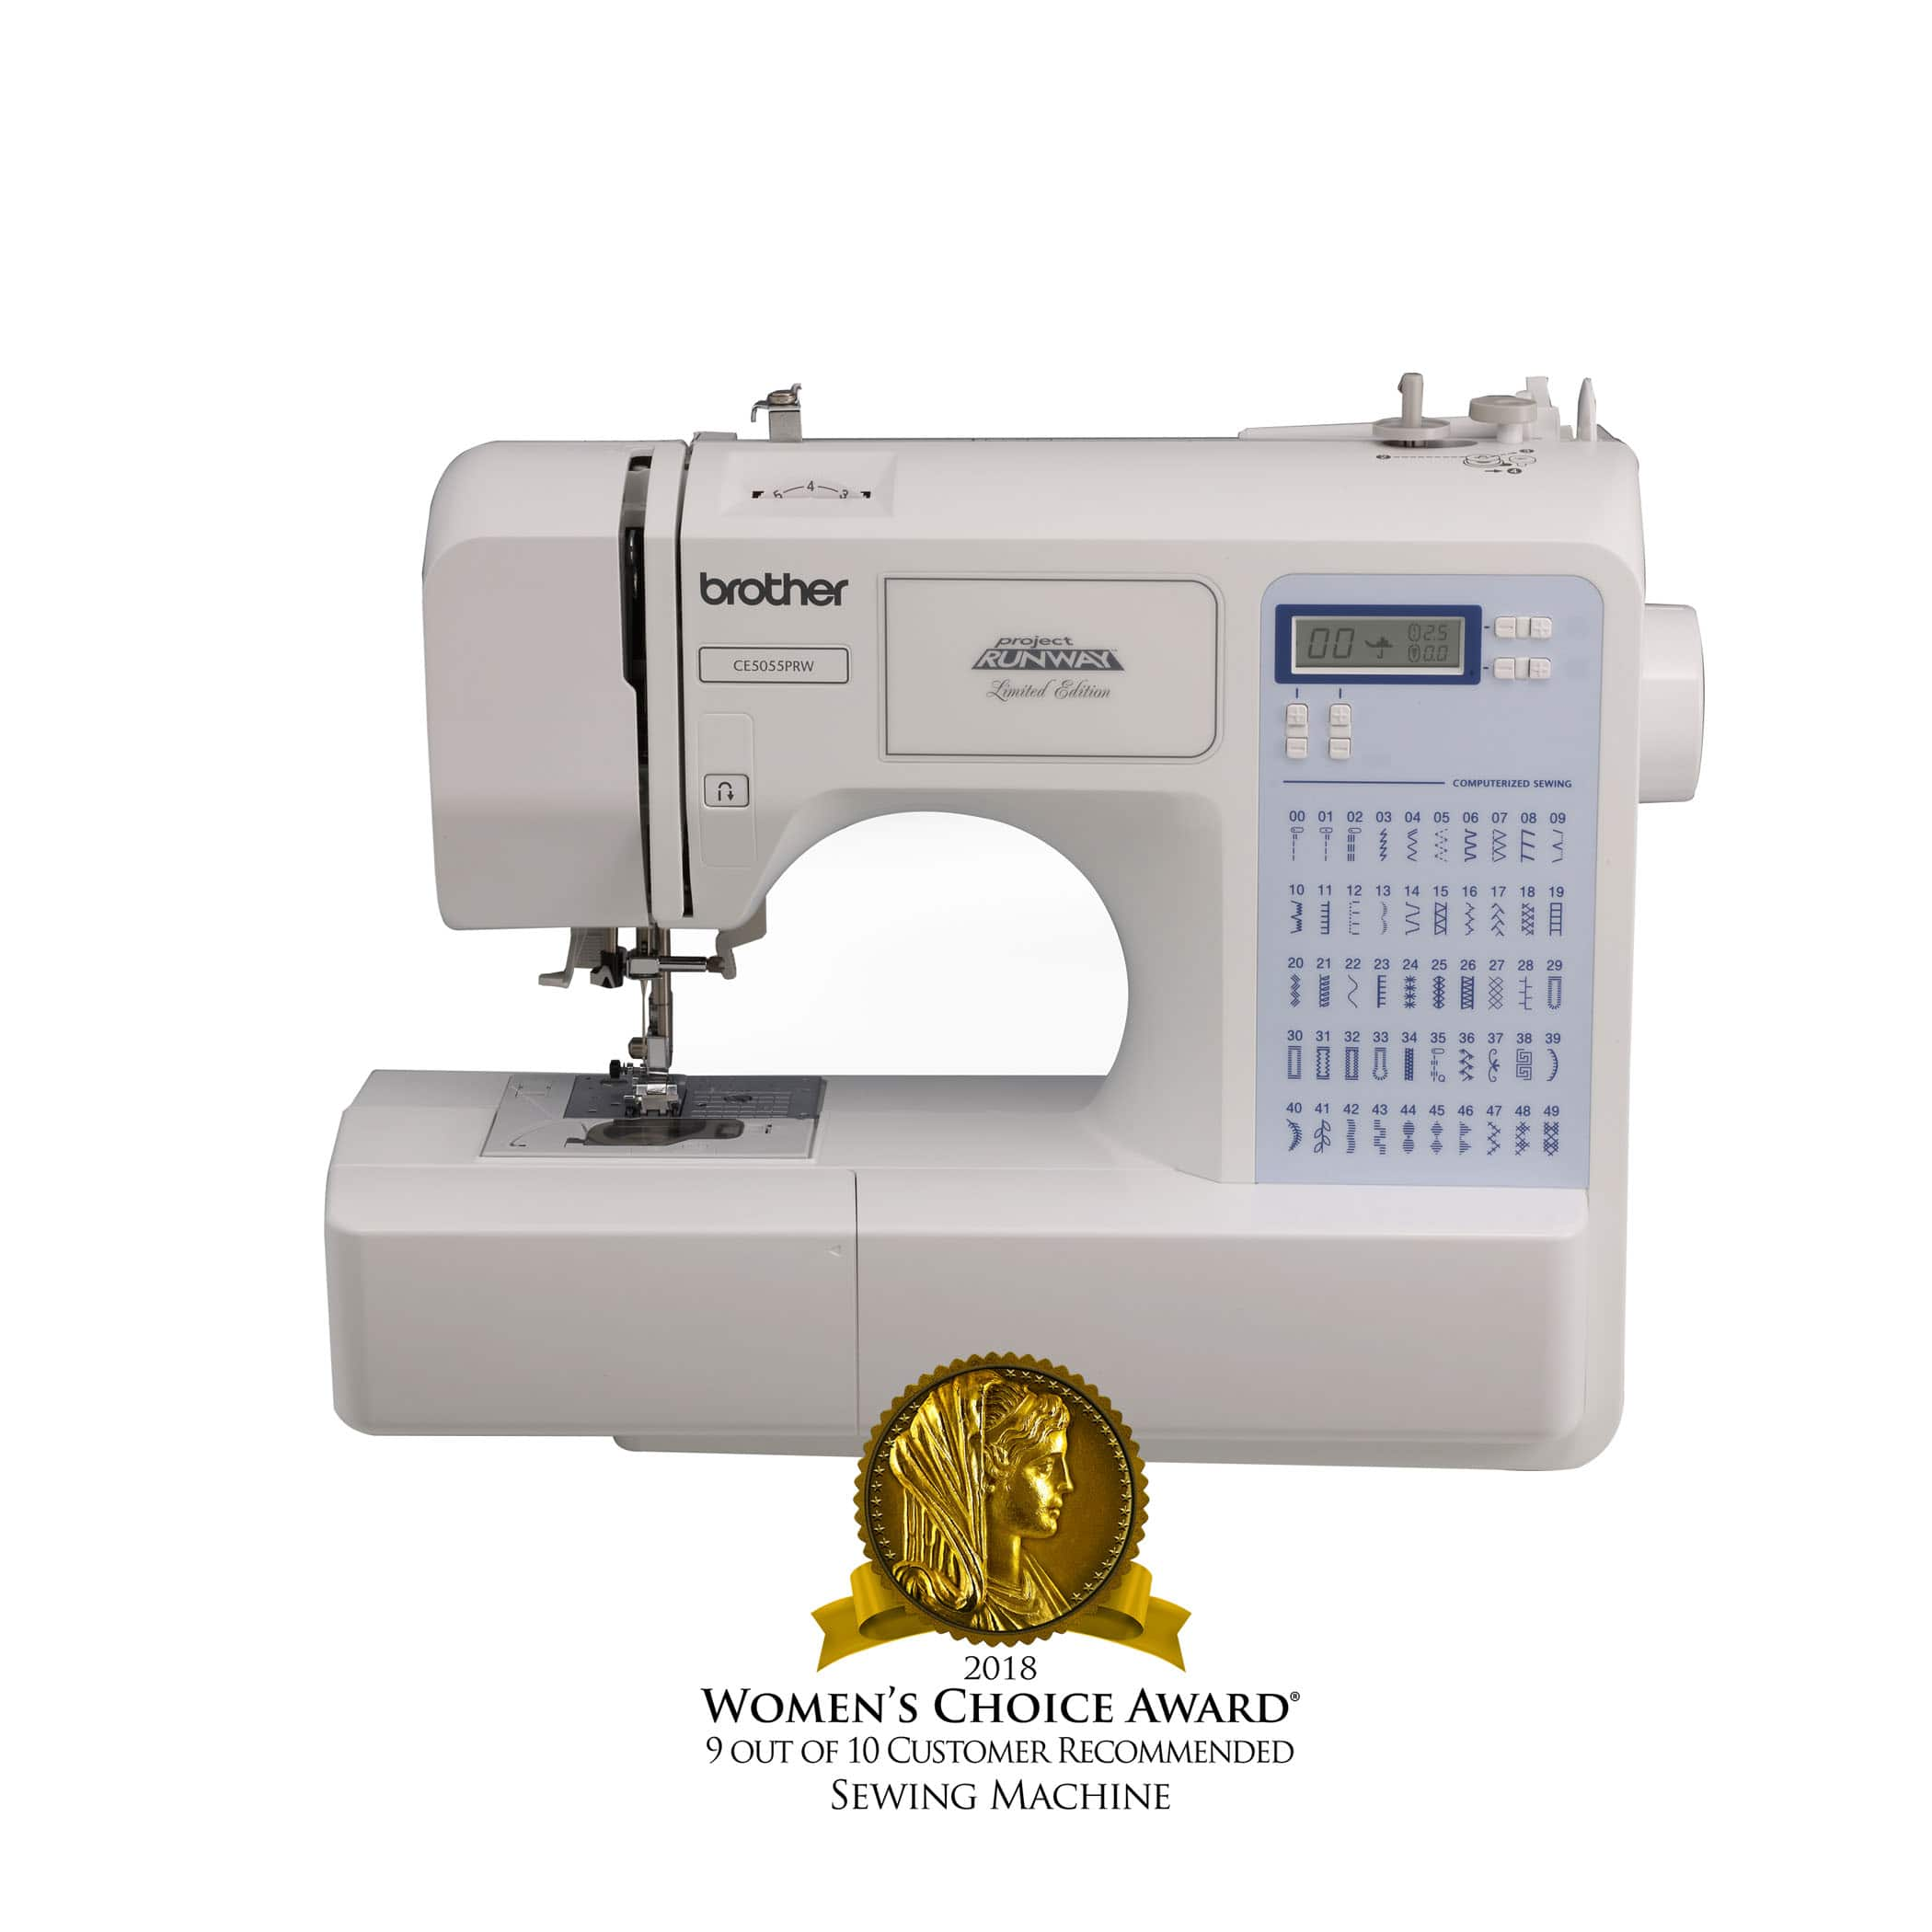 Brother CS5055prw 50-Stitch Project Runway Computerized Sewing Machine $94 at Walmart.com